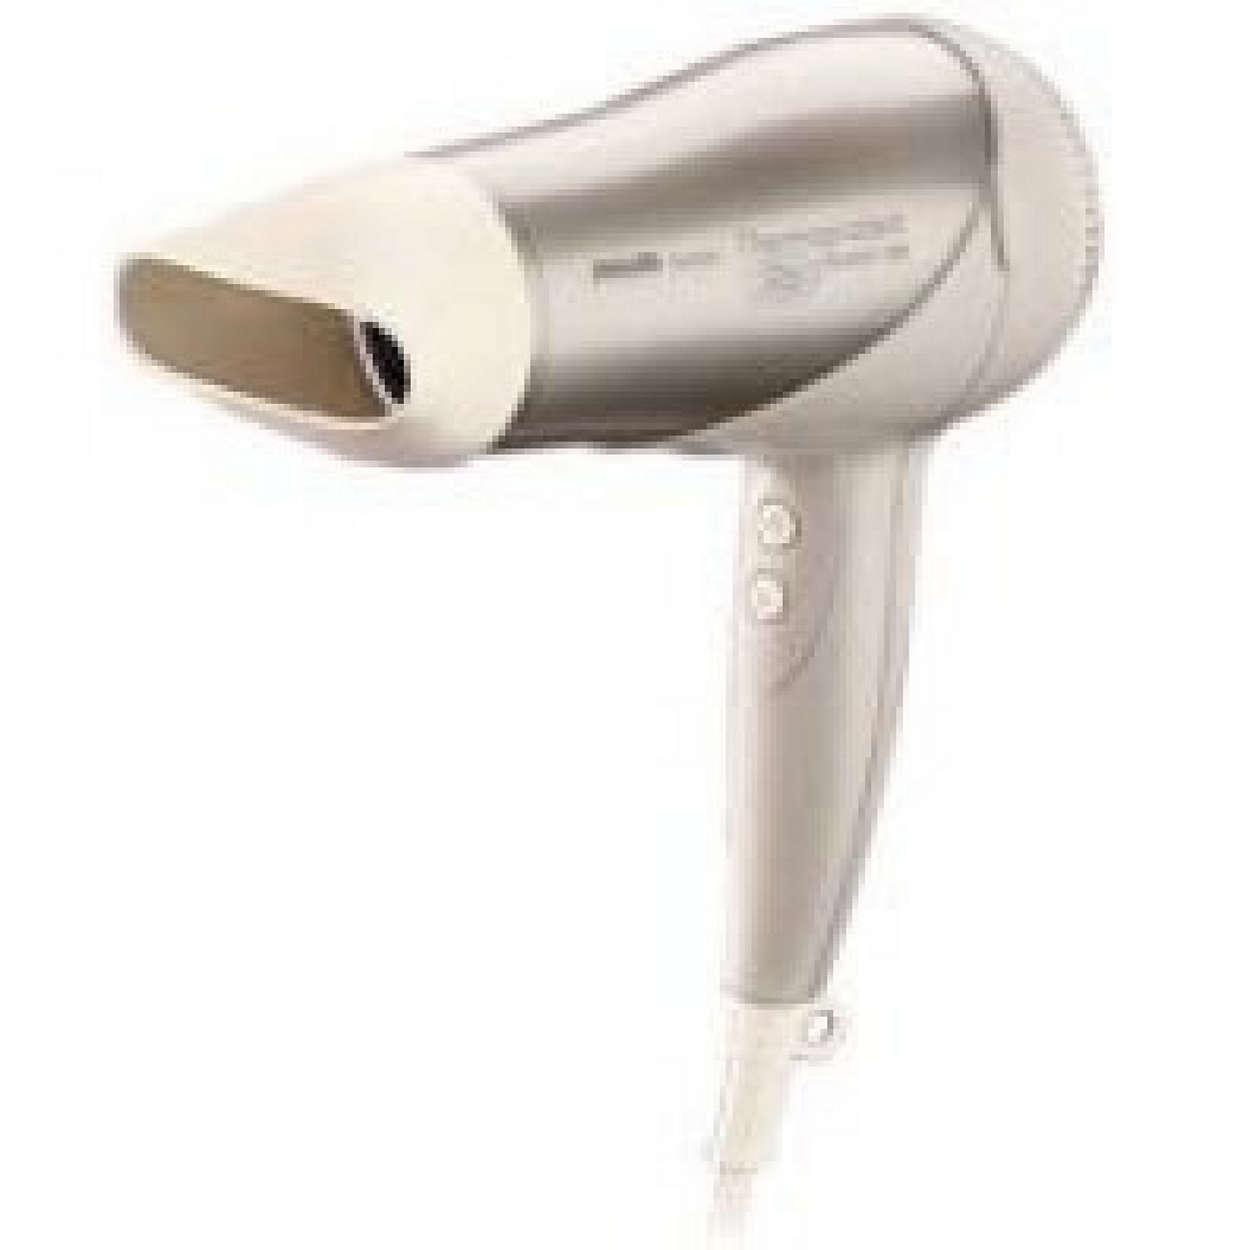 Das einzigartige Thermoflow-System